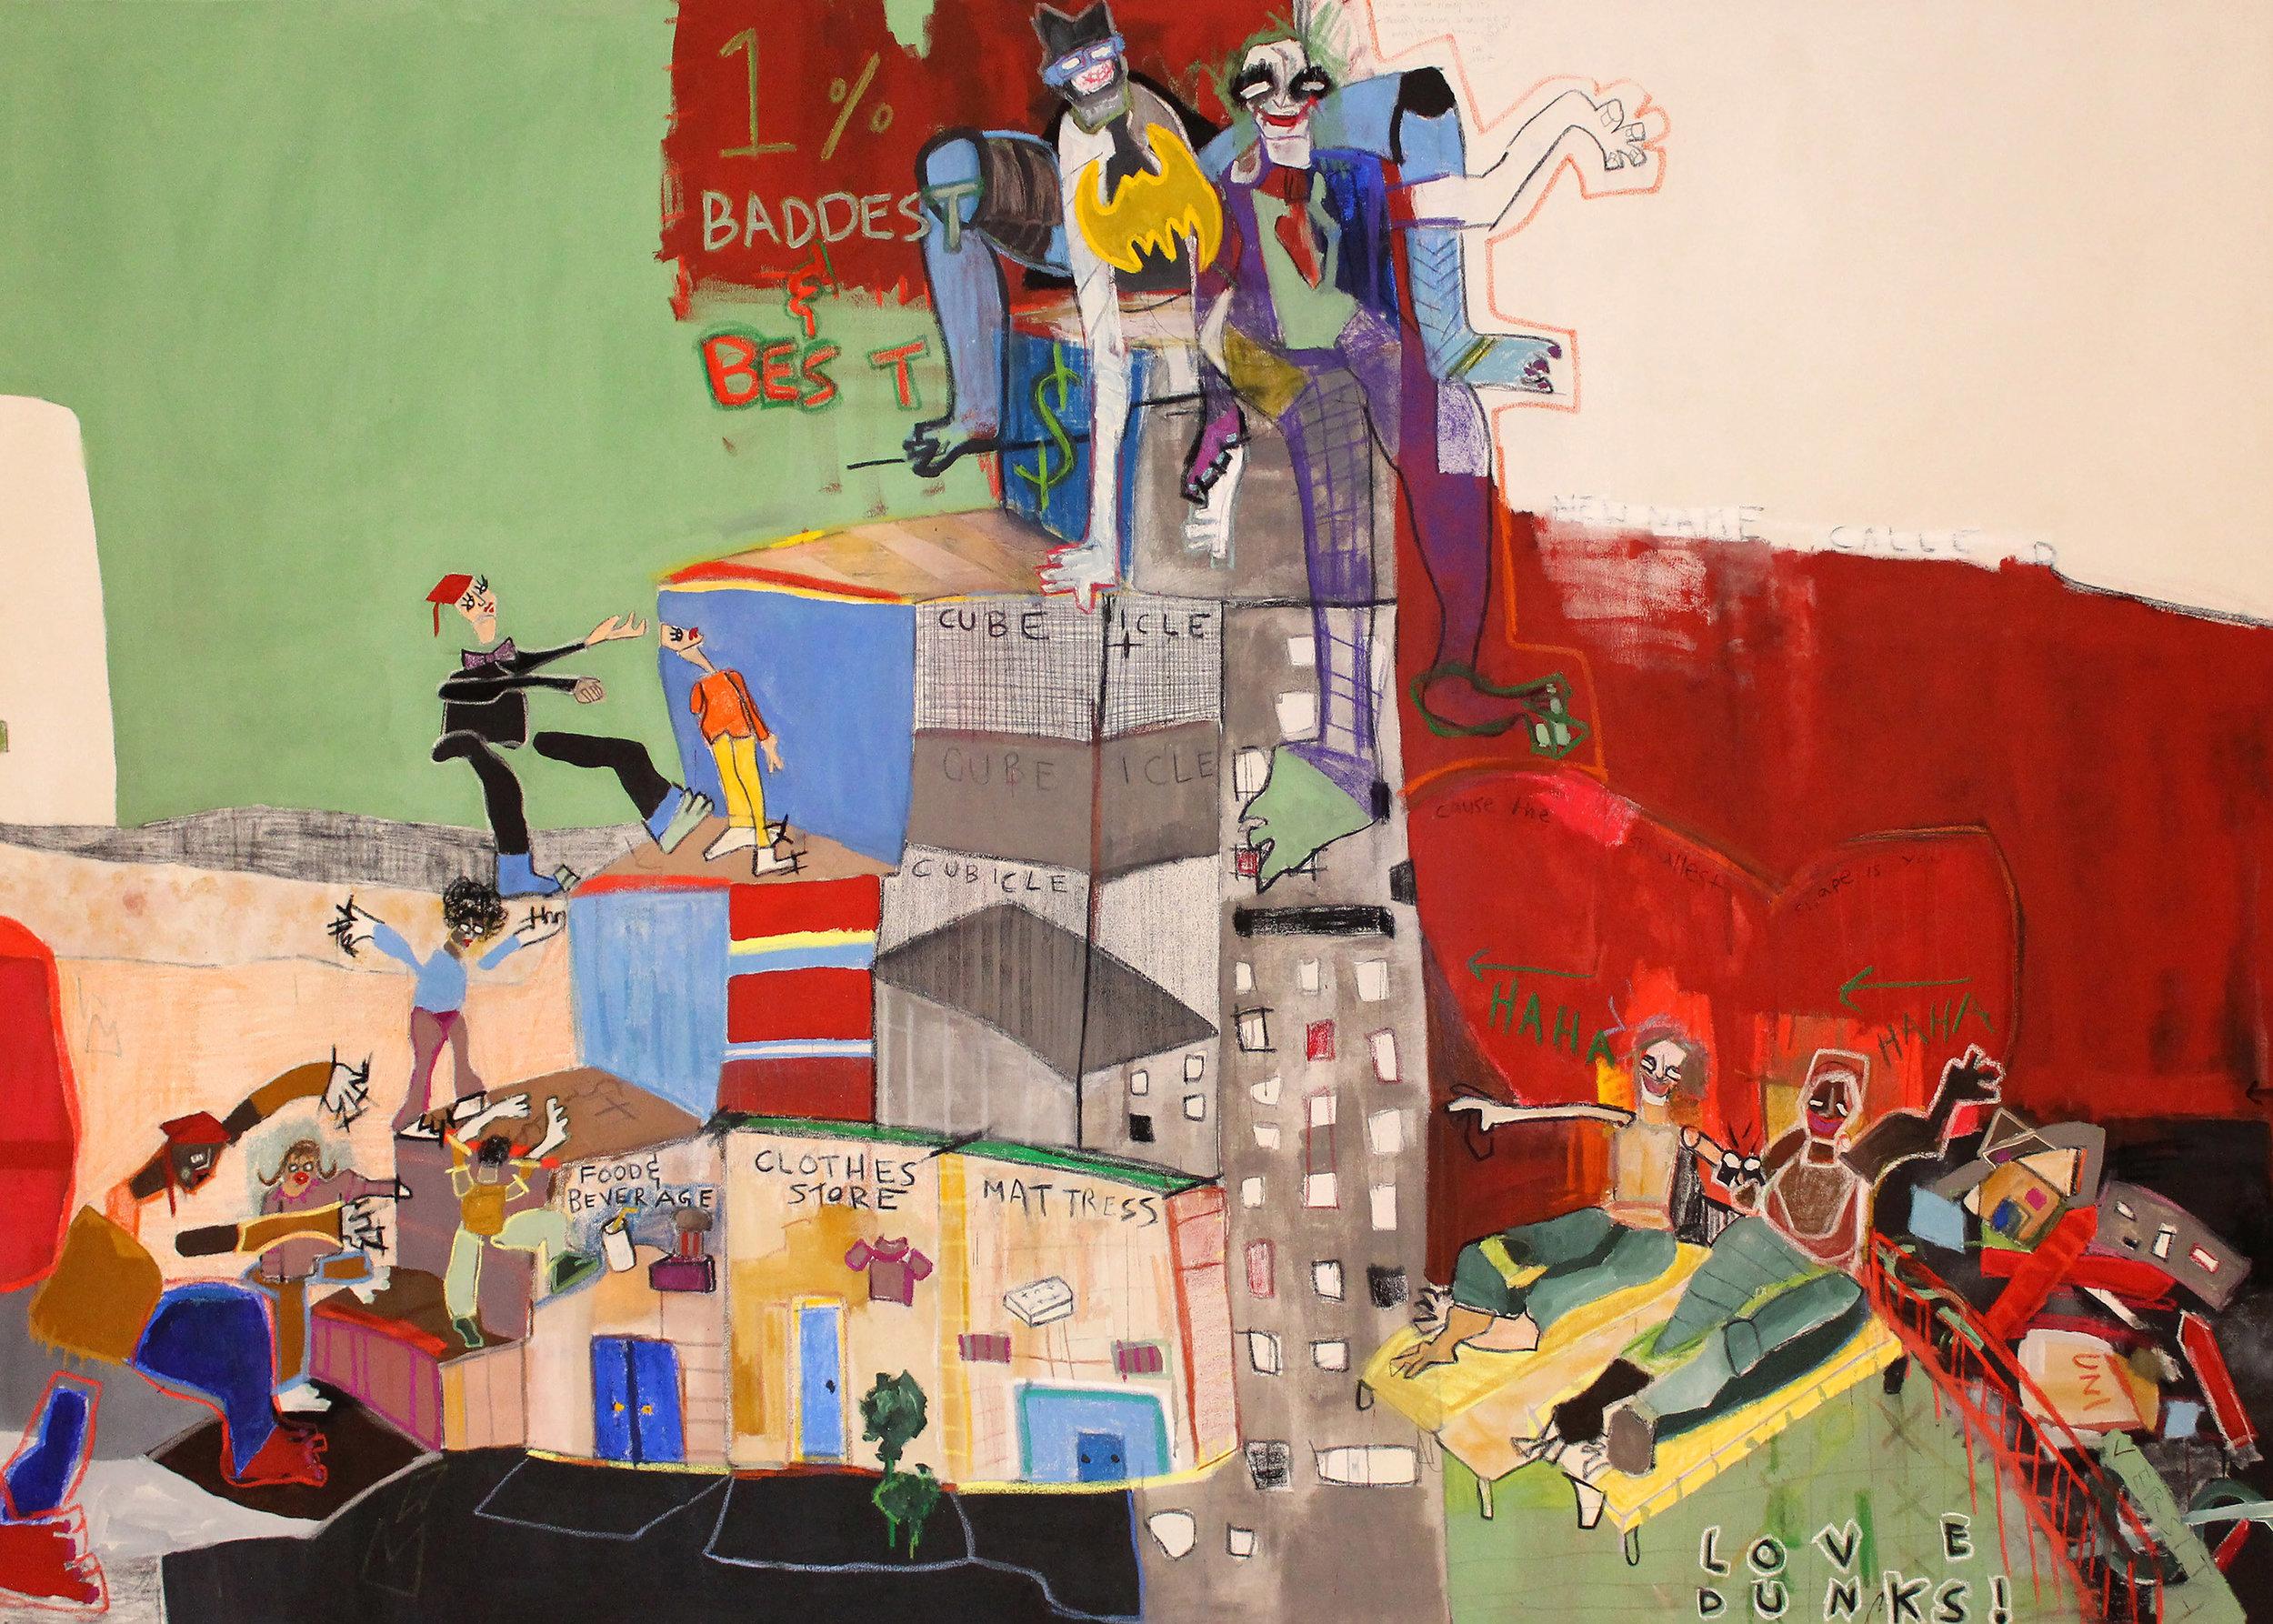 Income Inequality, Imagine Panel 3 8' x 5.5' Panel 3 ArtPrize 9 | Grand Rapids Art Museum